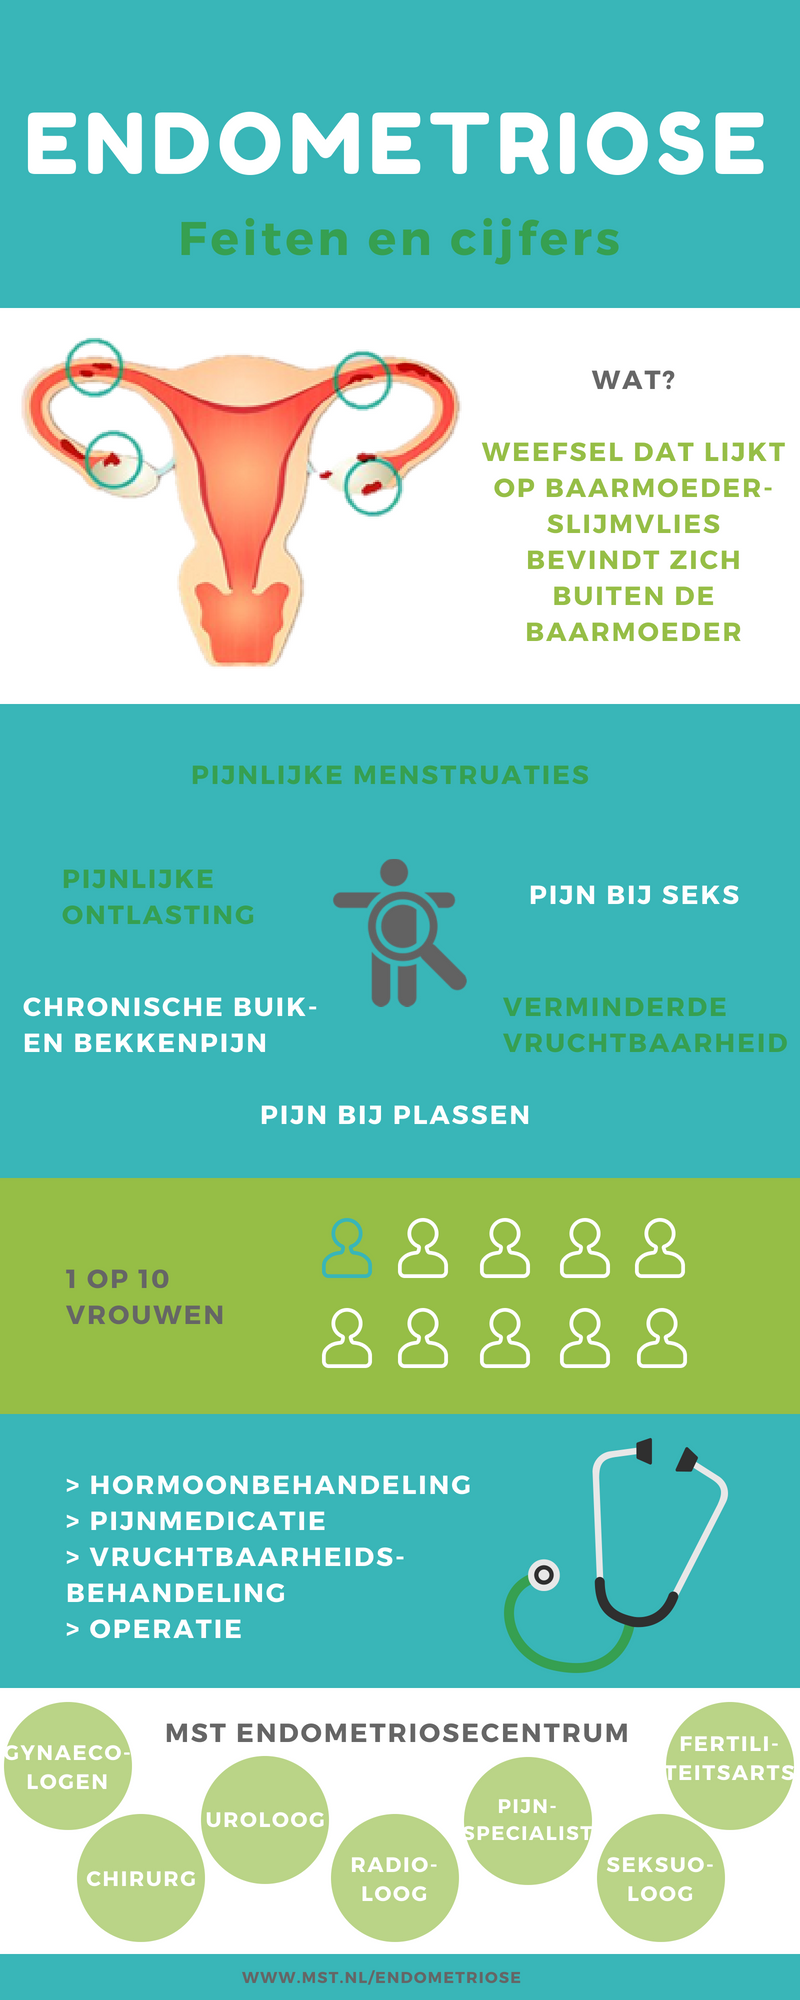 Infographic endometriose